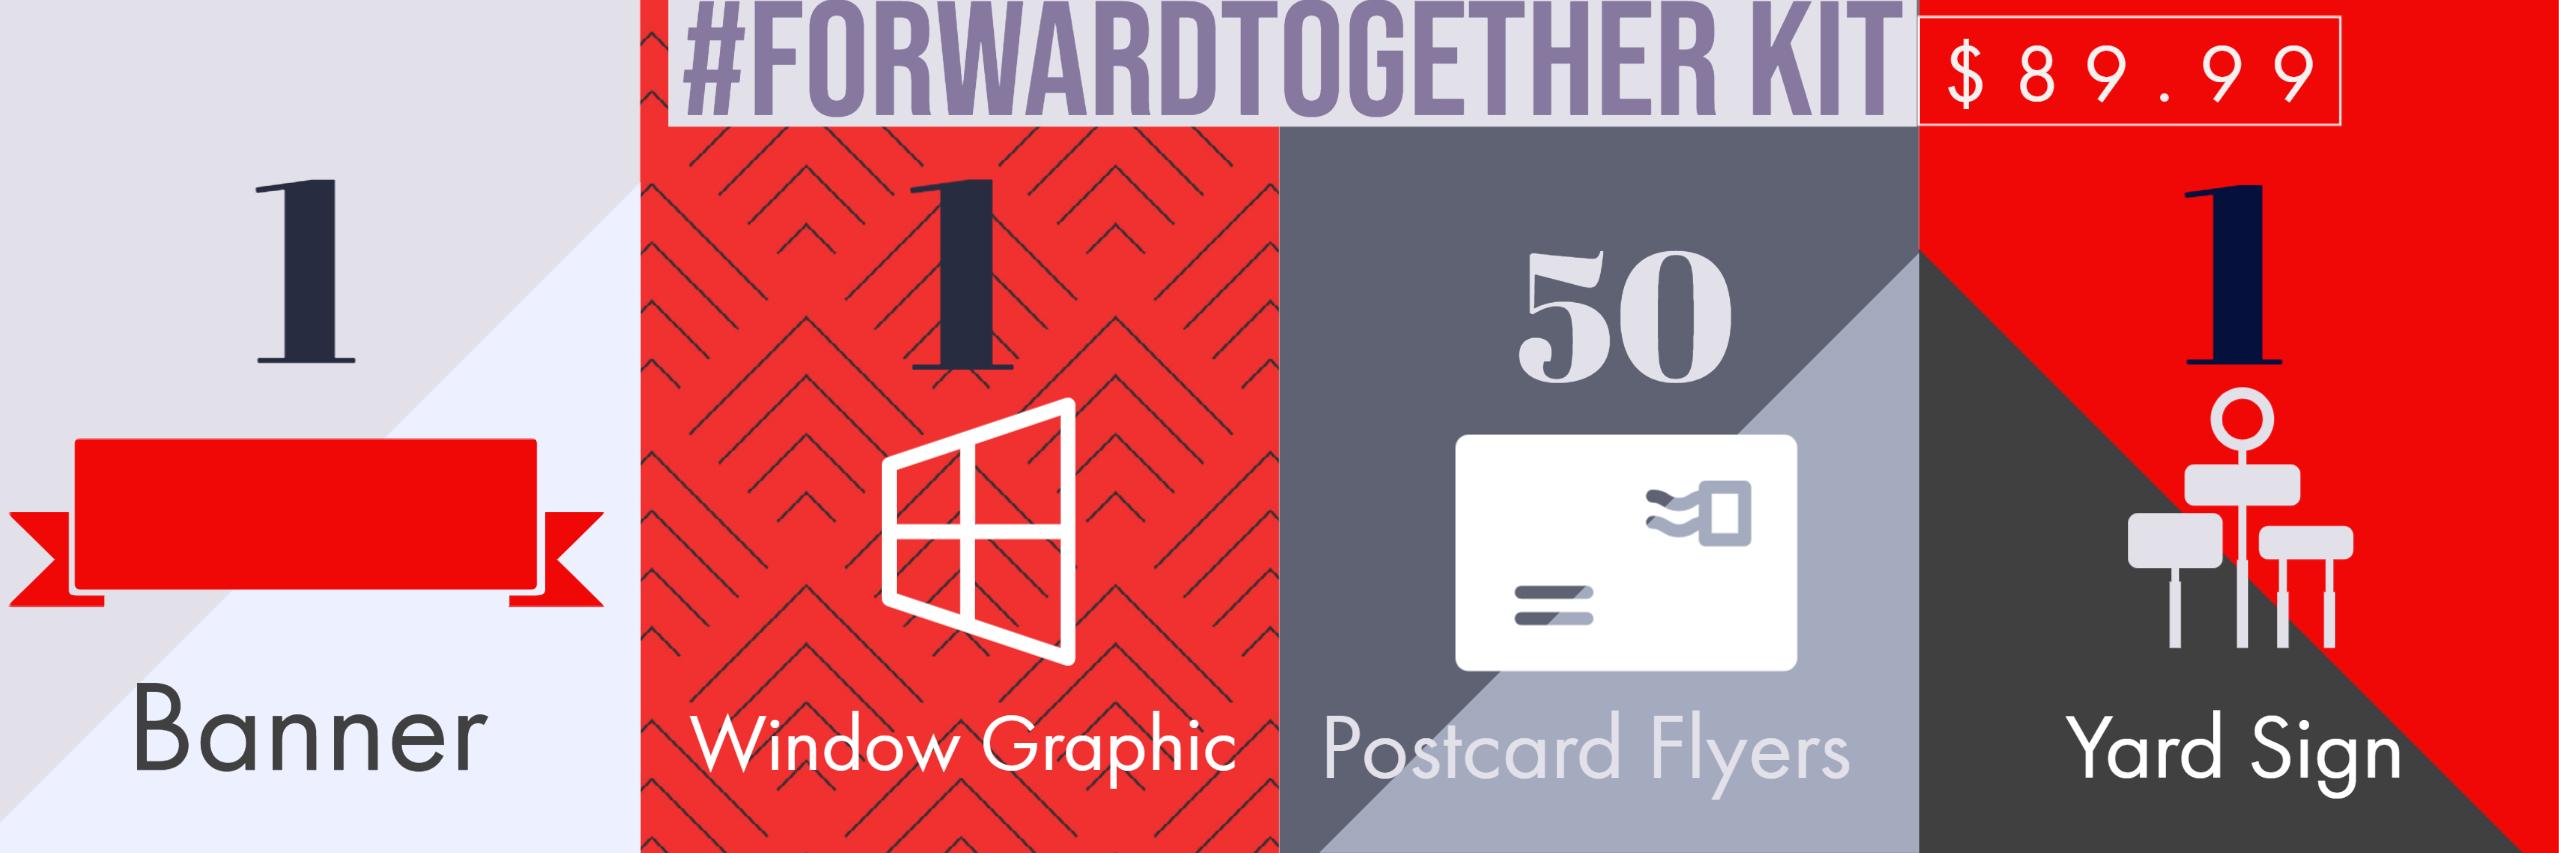 Forward together Kit Cover Image